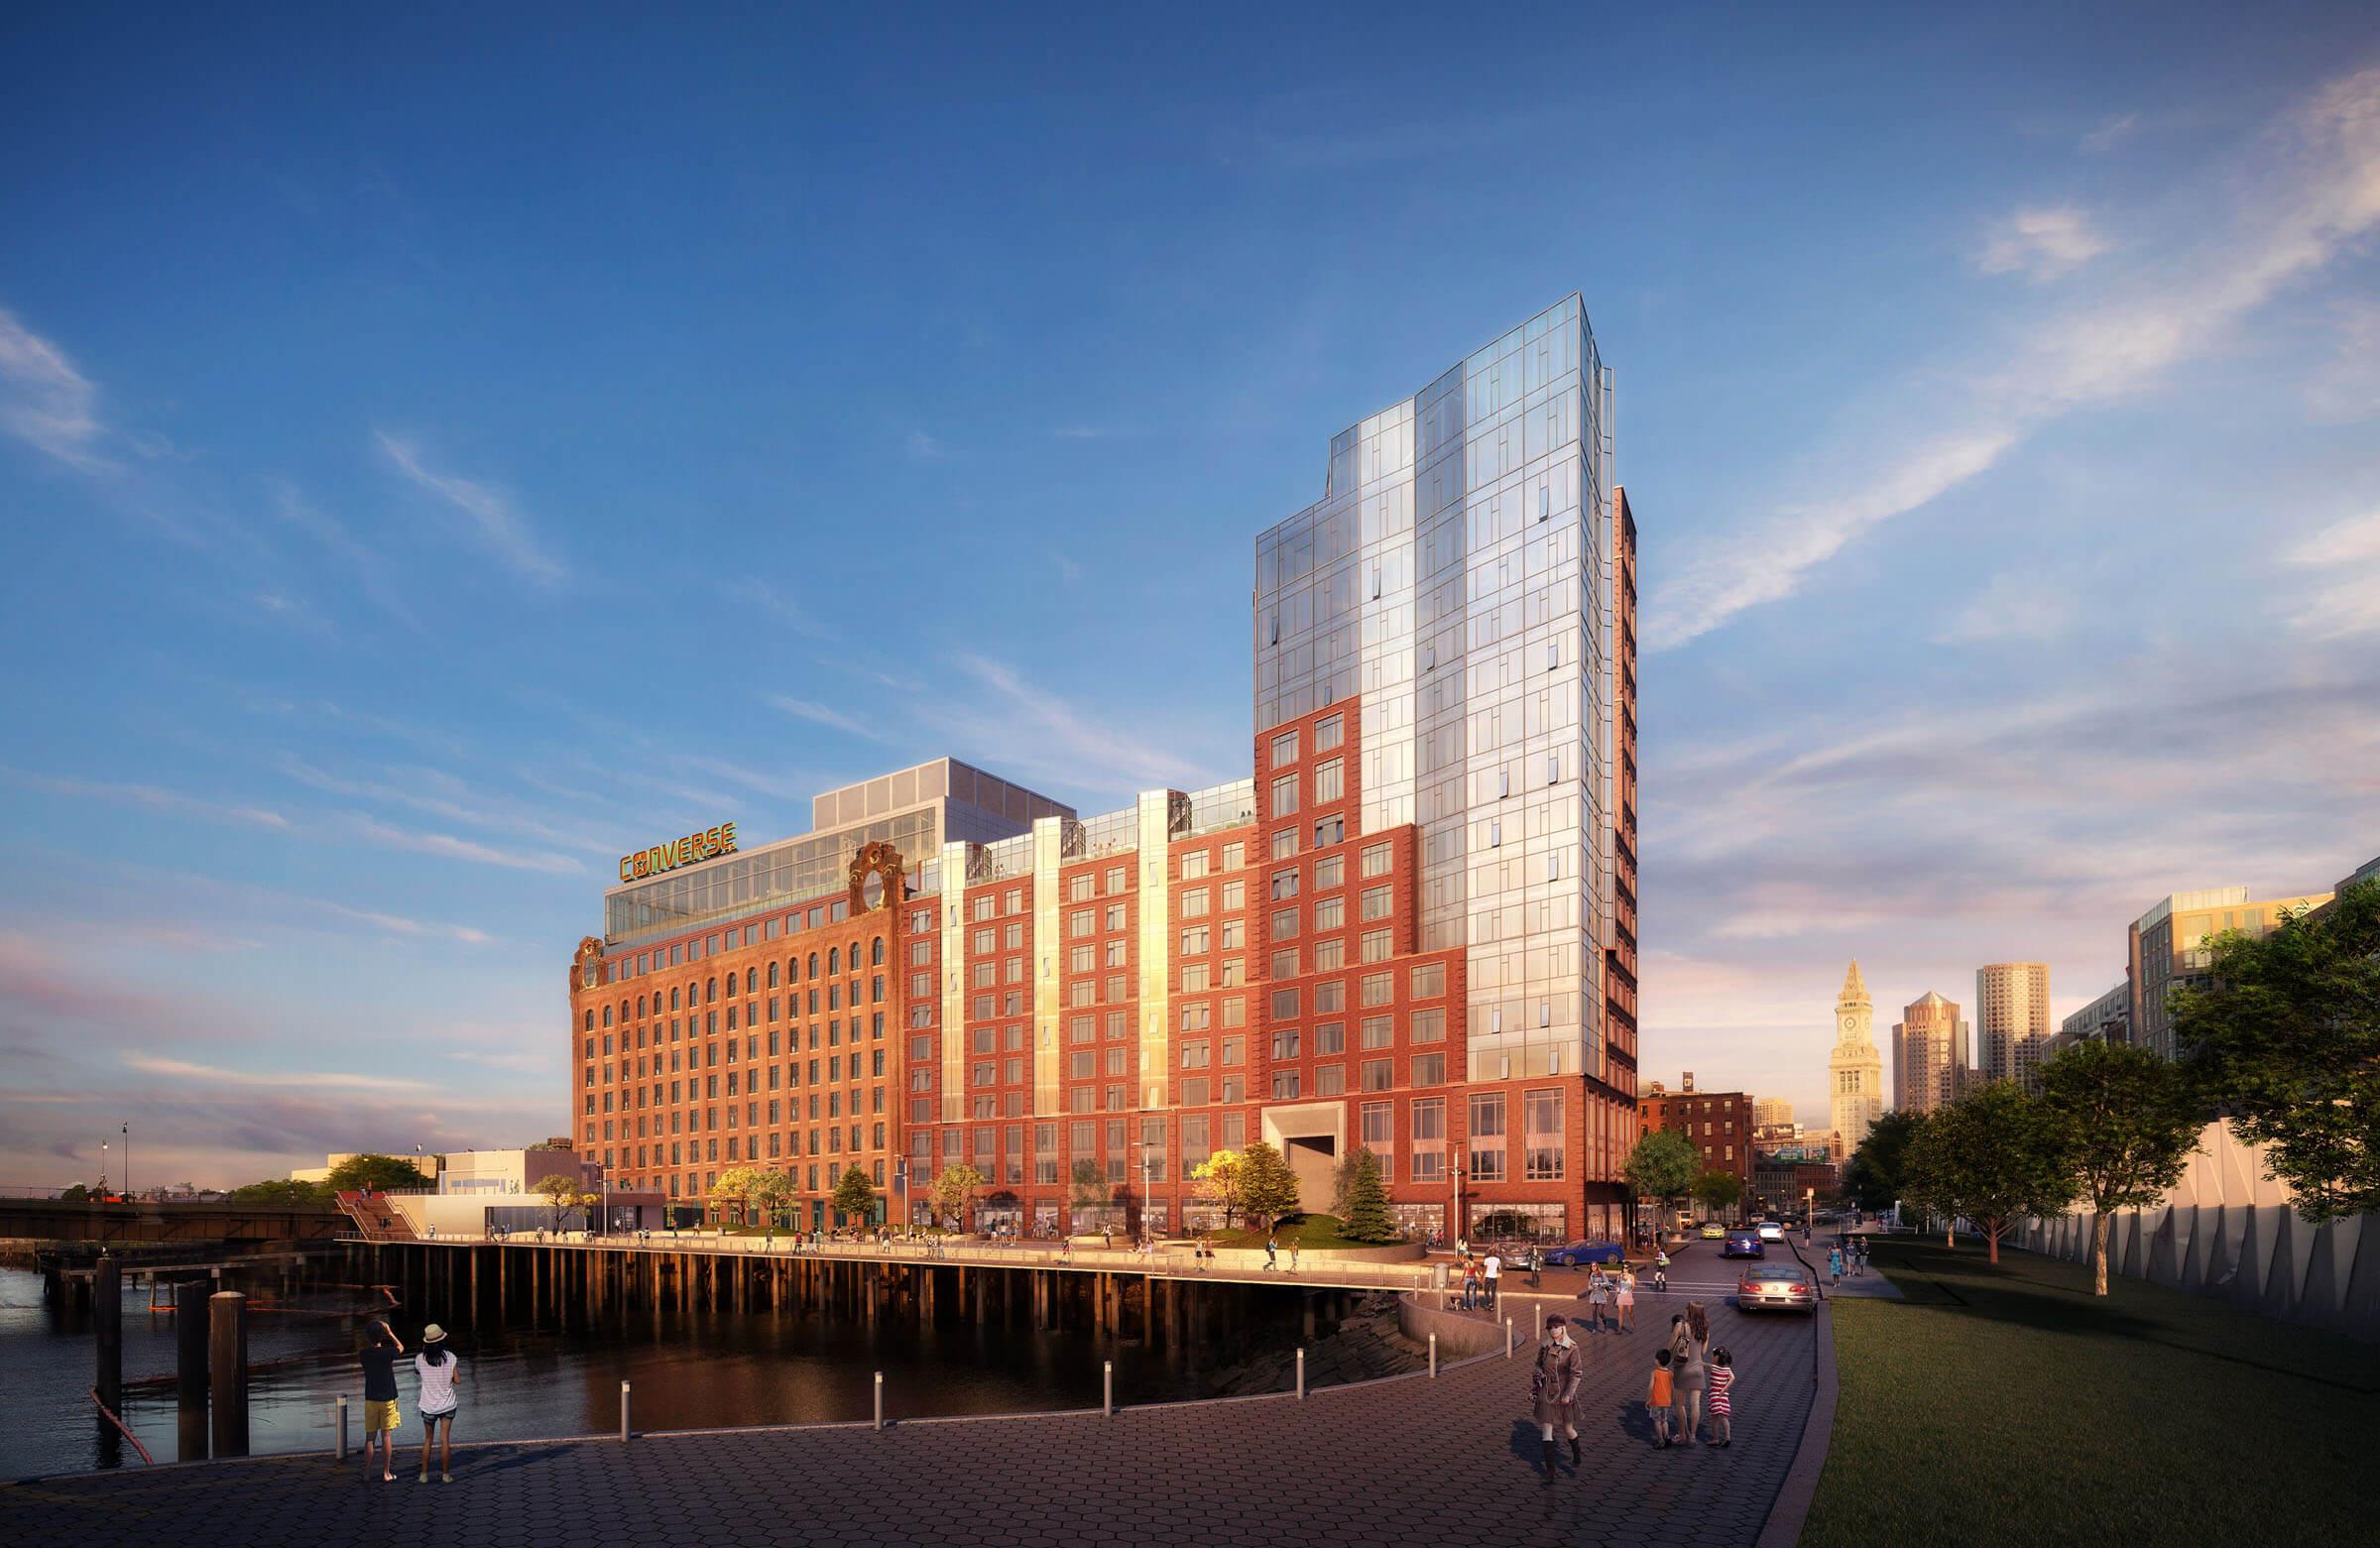 Image of Lovejoy Wharf